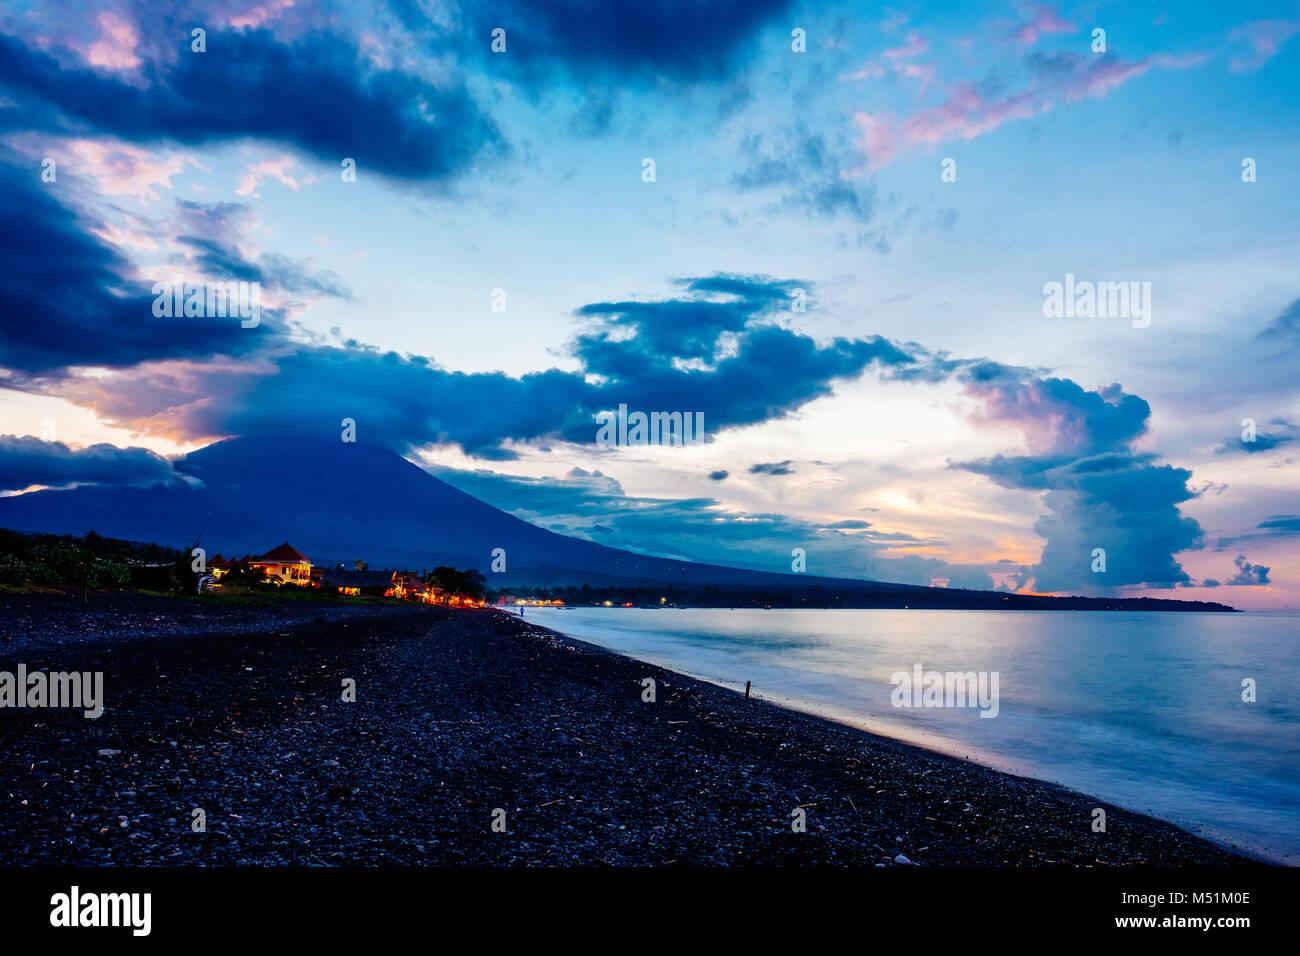 Mount Agung (Gunung Agung) seen from Amed Beach at dusk, Karangasem Regency, Bali, Indonesia. - Stock Image